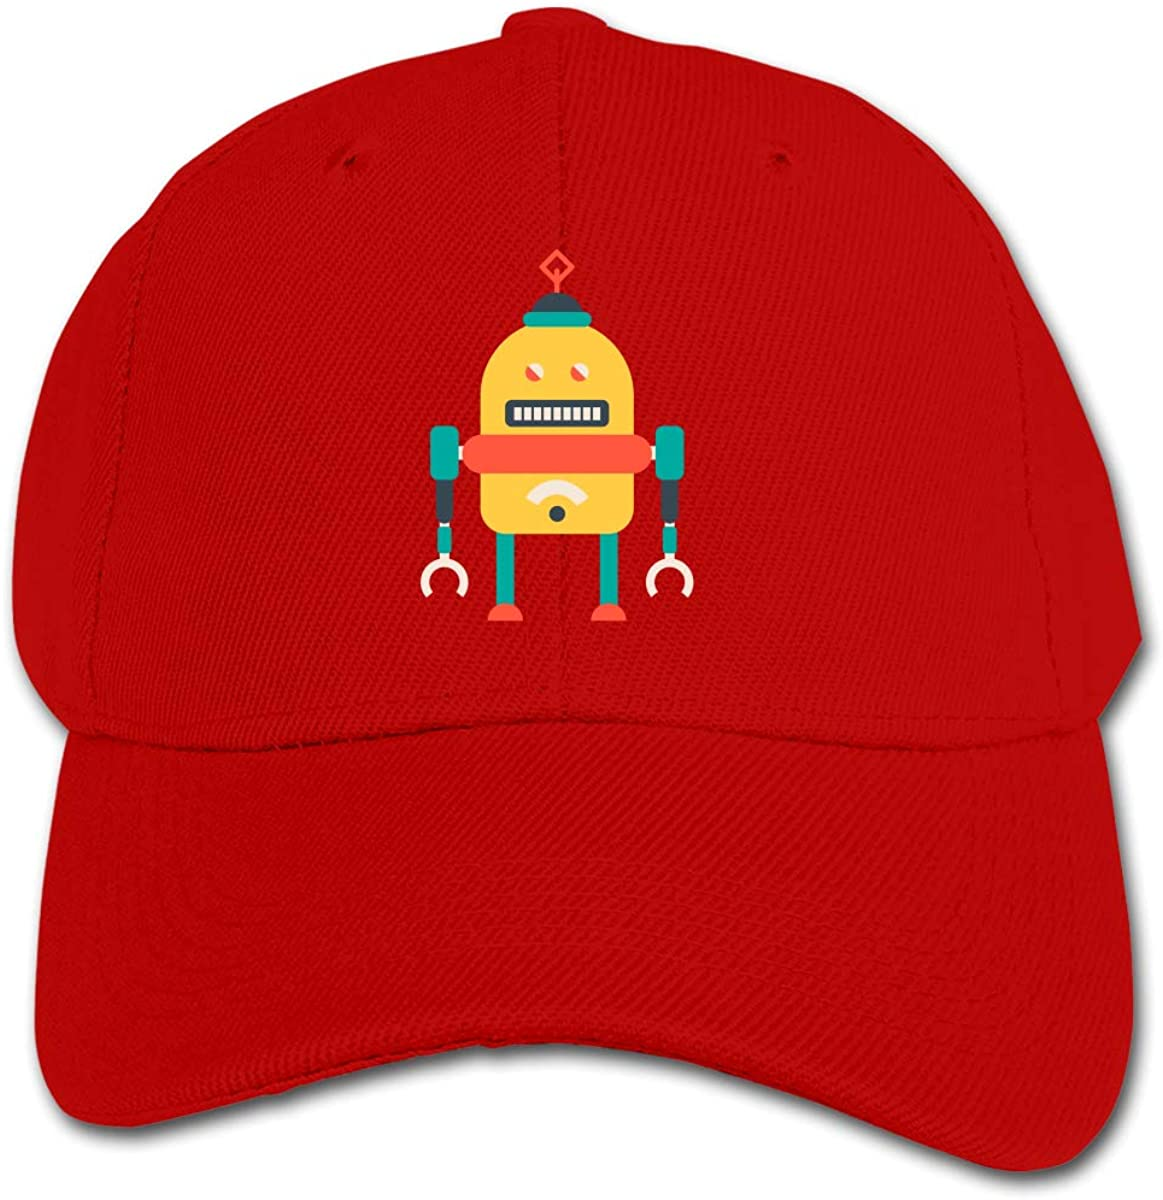 The Robot Kids Baseball Cap Hat Unisex Toddler Sun Hat Adsjutable Trucker Hat